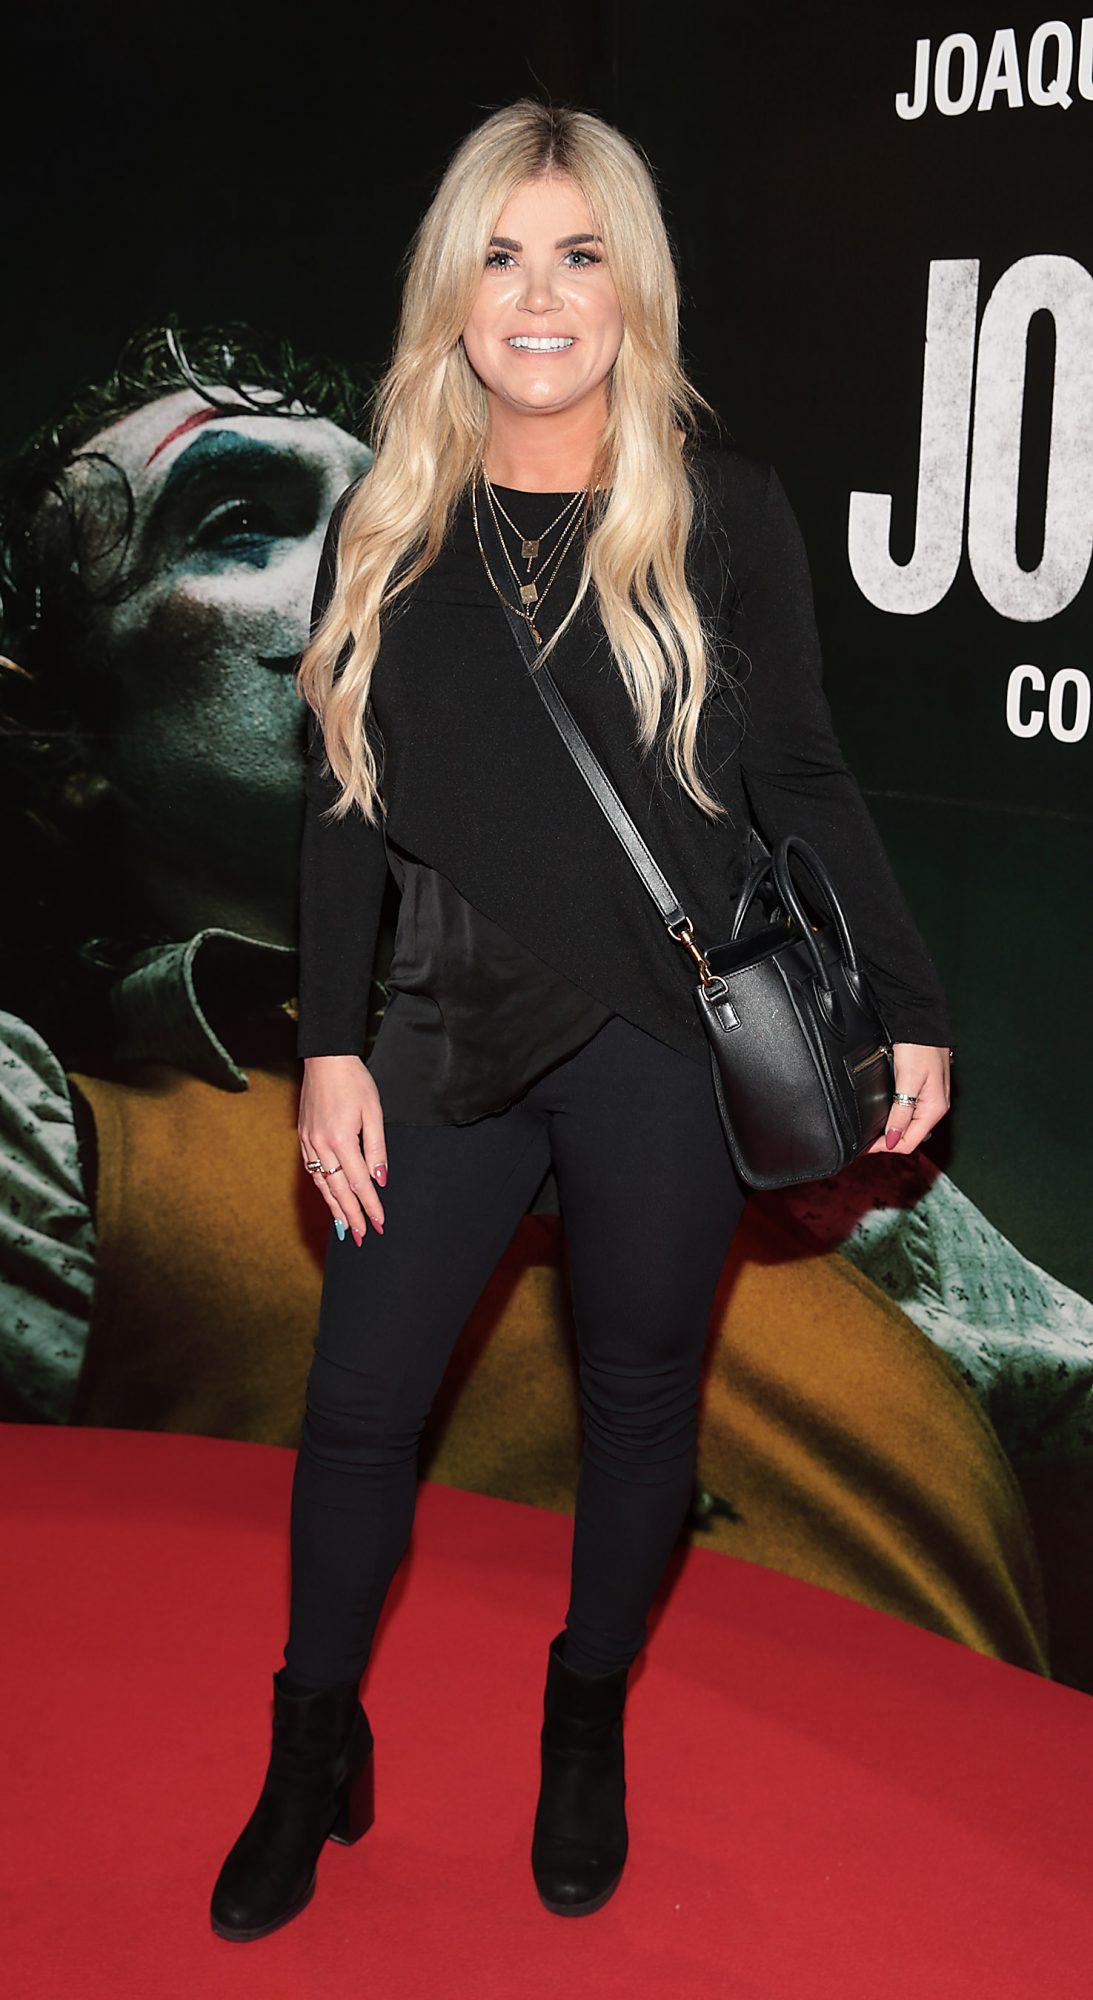 Katie Slein at the Irish Premiere screening of Joker at Cineworld, Dublin. Pic: Brian McEvoy.